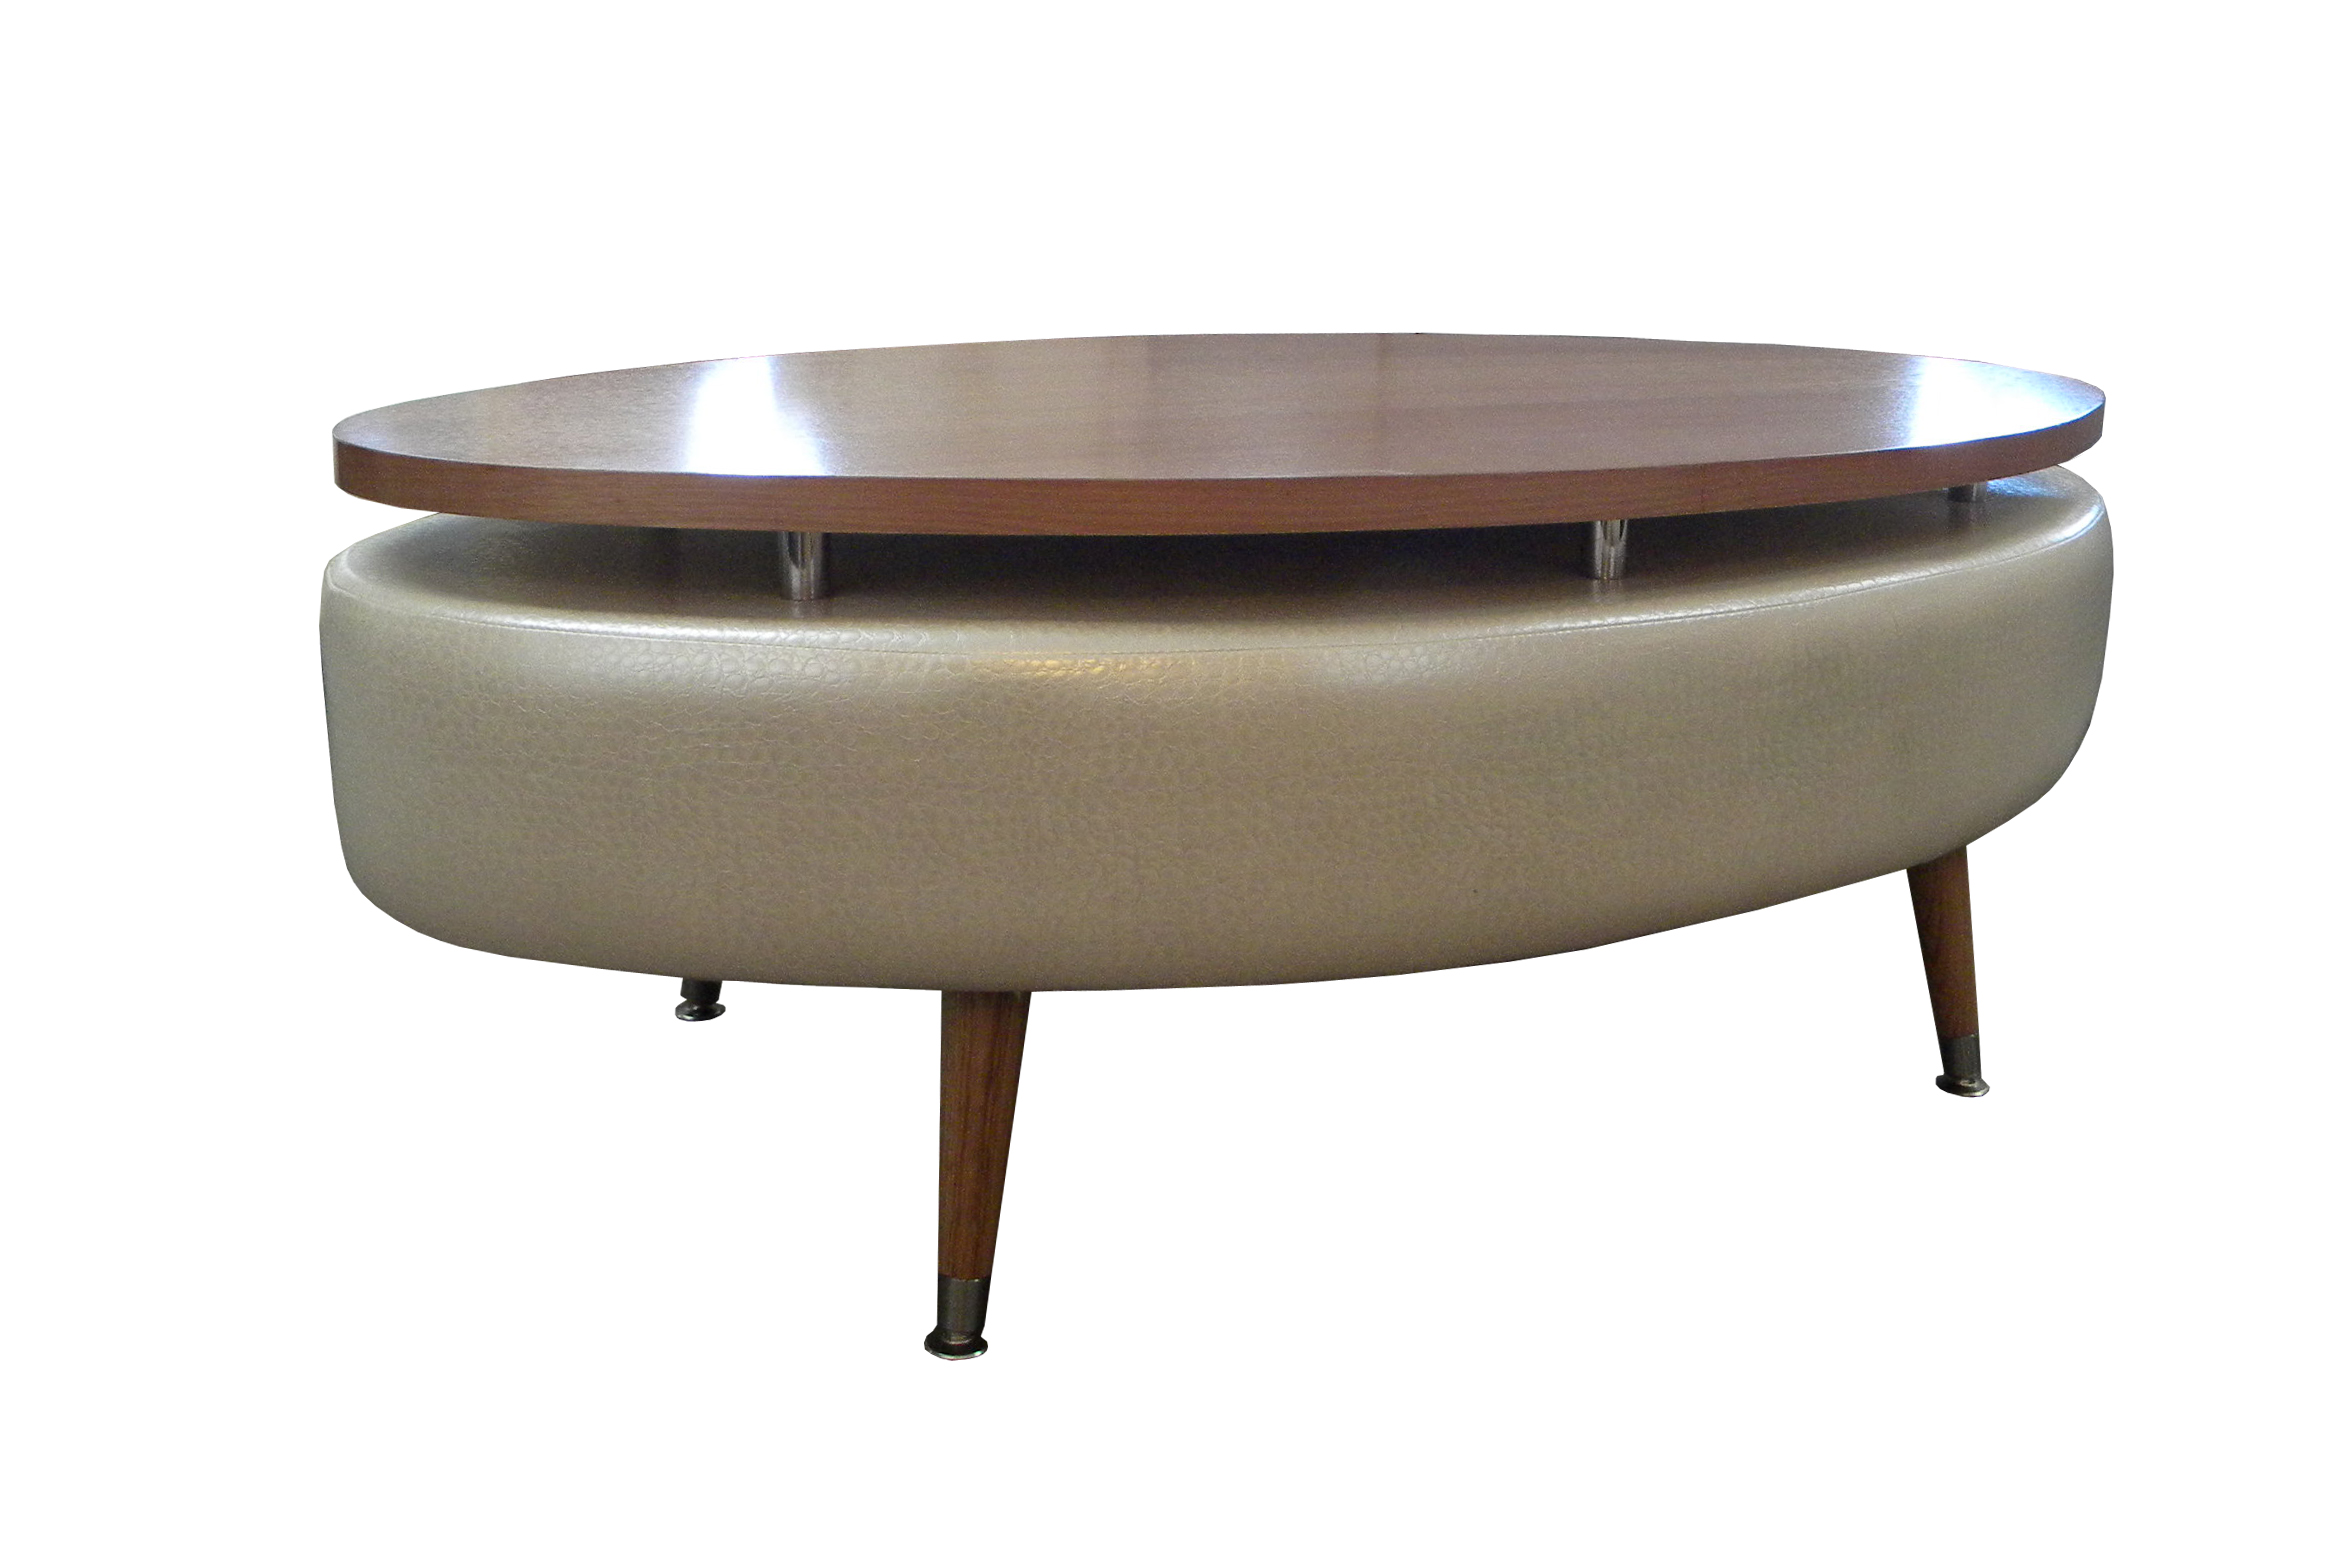 Arne Table